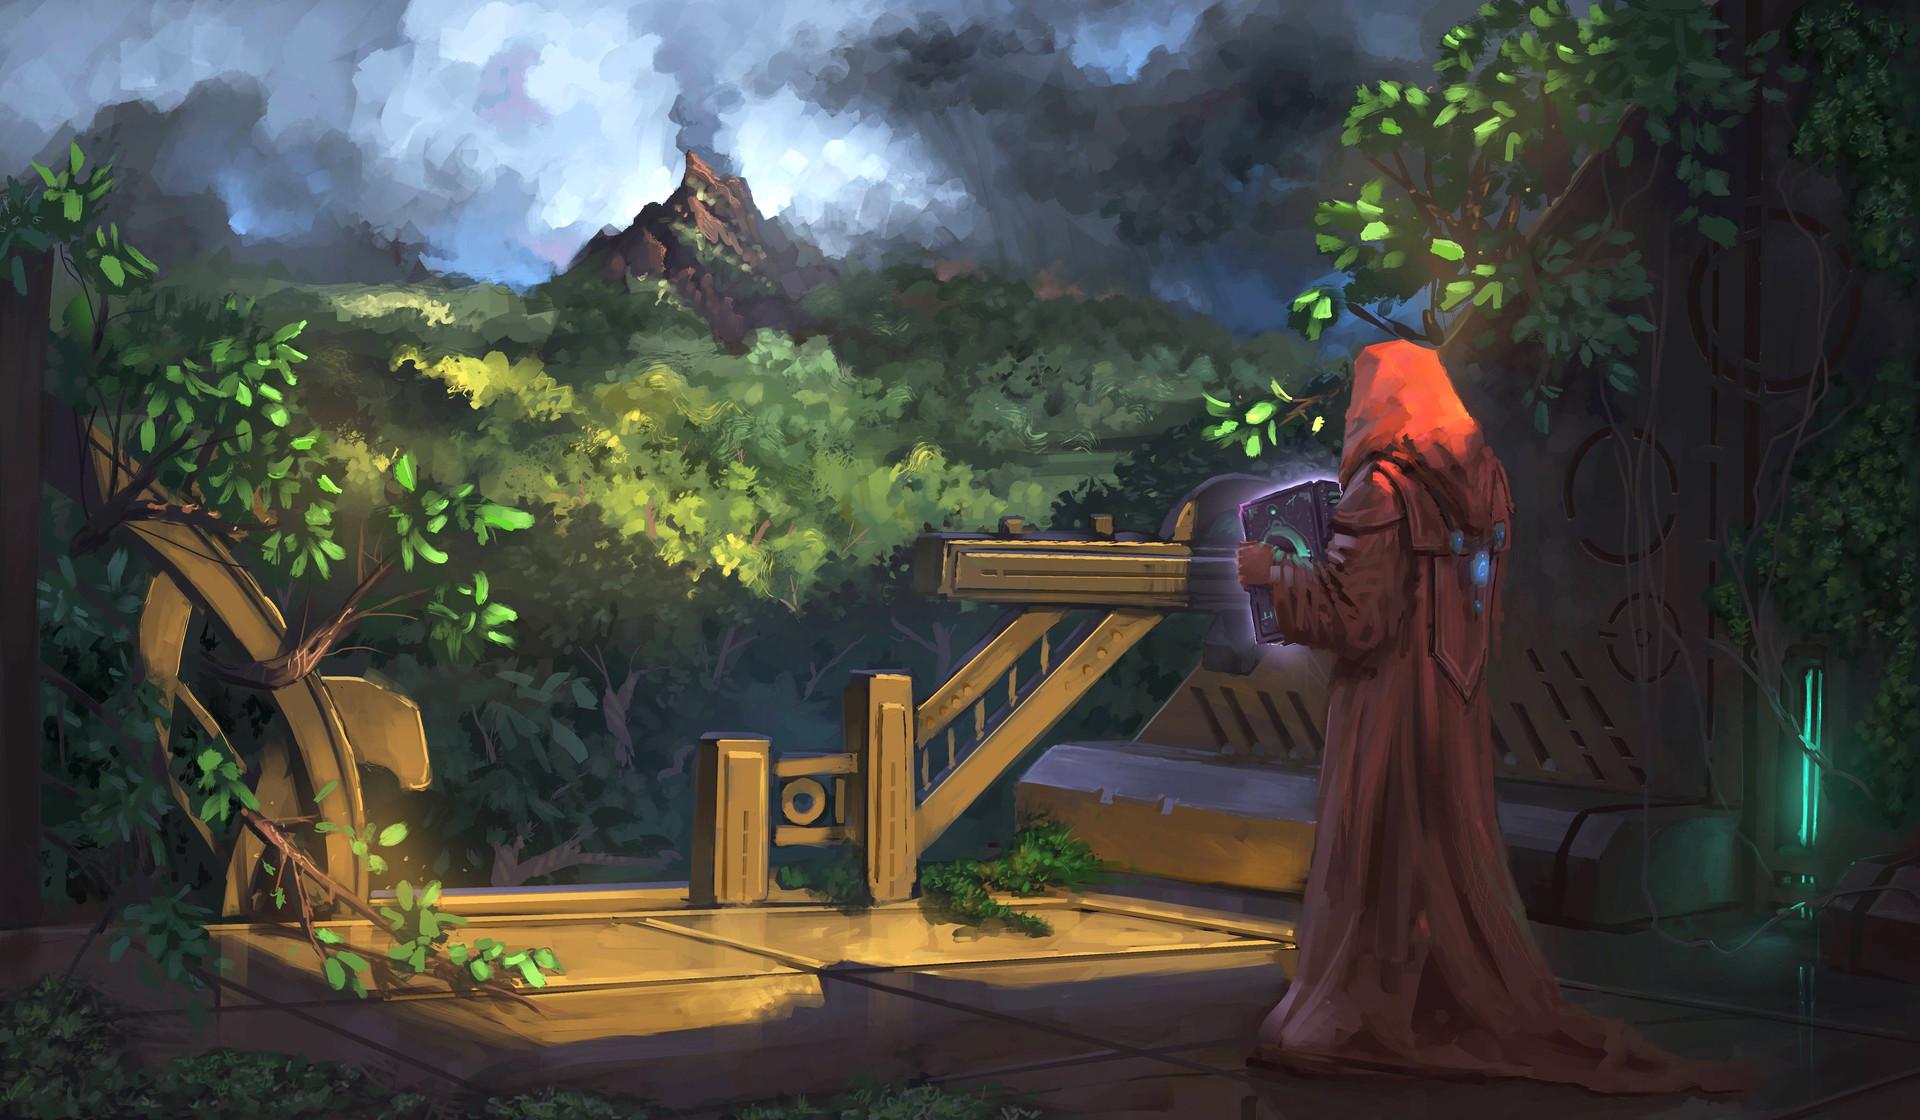 General 1920x1120 Jeremy Adams concept art forest sorcerer books mantle gazebo men sheet dark nature